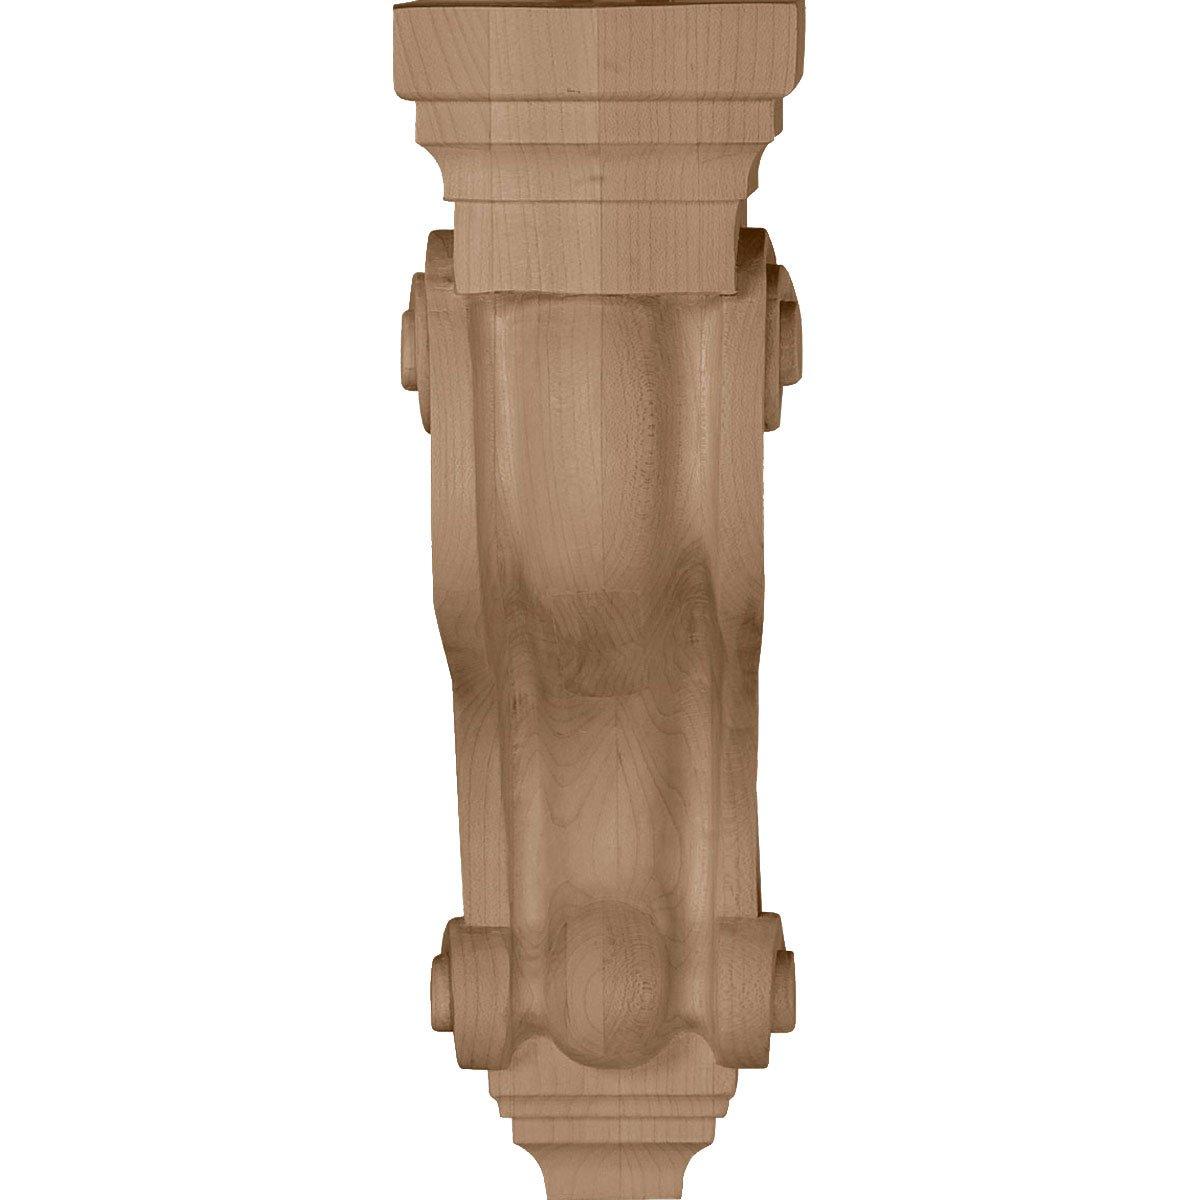 , 2-Pack Alder Ekena Millwork COR03X08X13TSAL-CASE-2 3 7//8 inch W x 8 inch D x 13 inch H Boston Traditional Scroll Corbel